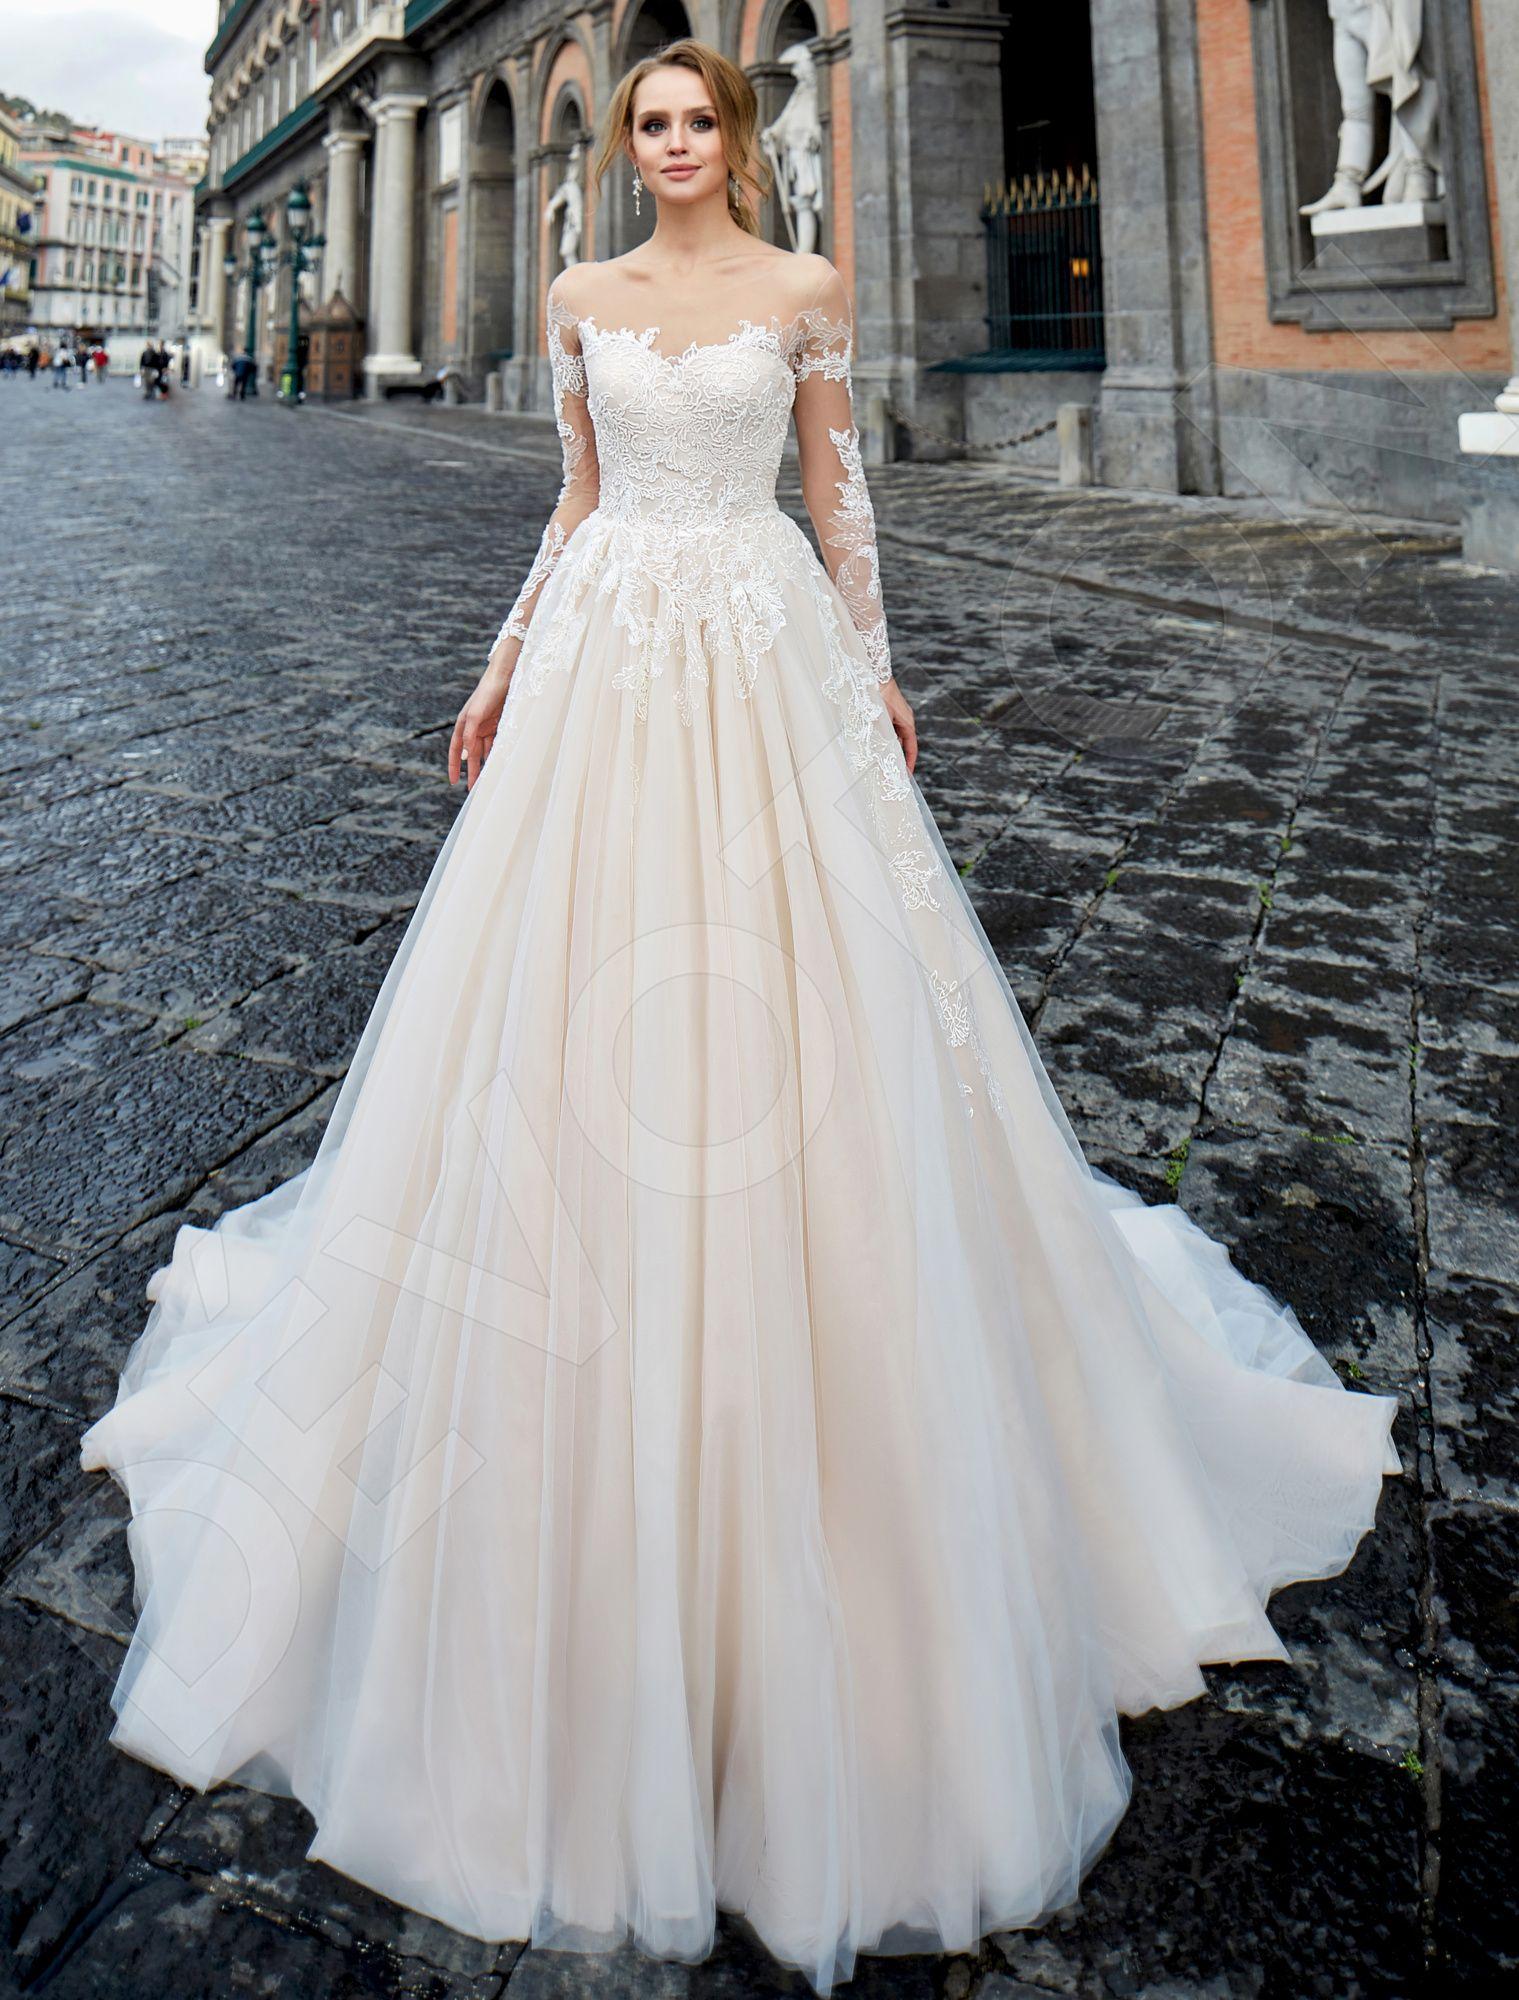 Nansia Classic Tulle Wedding dress Nude / Powder | Devotiondresses.com